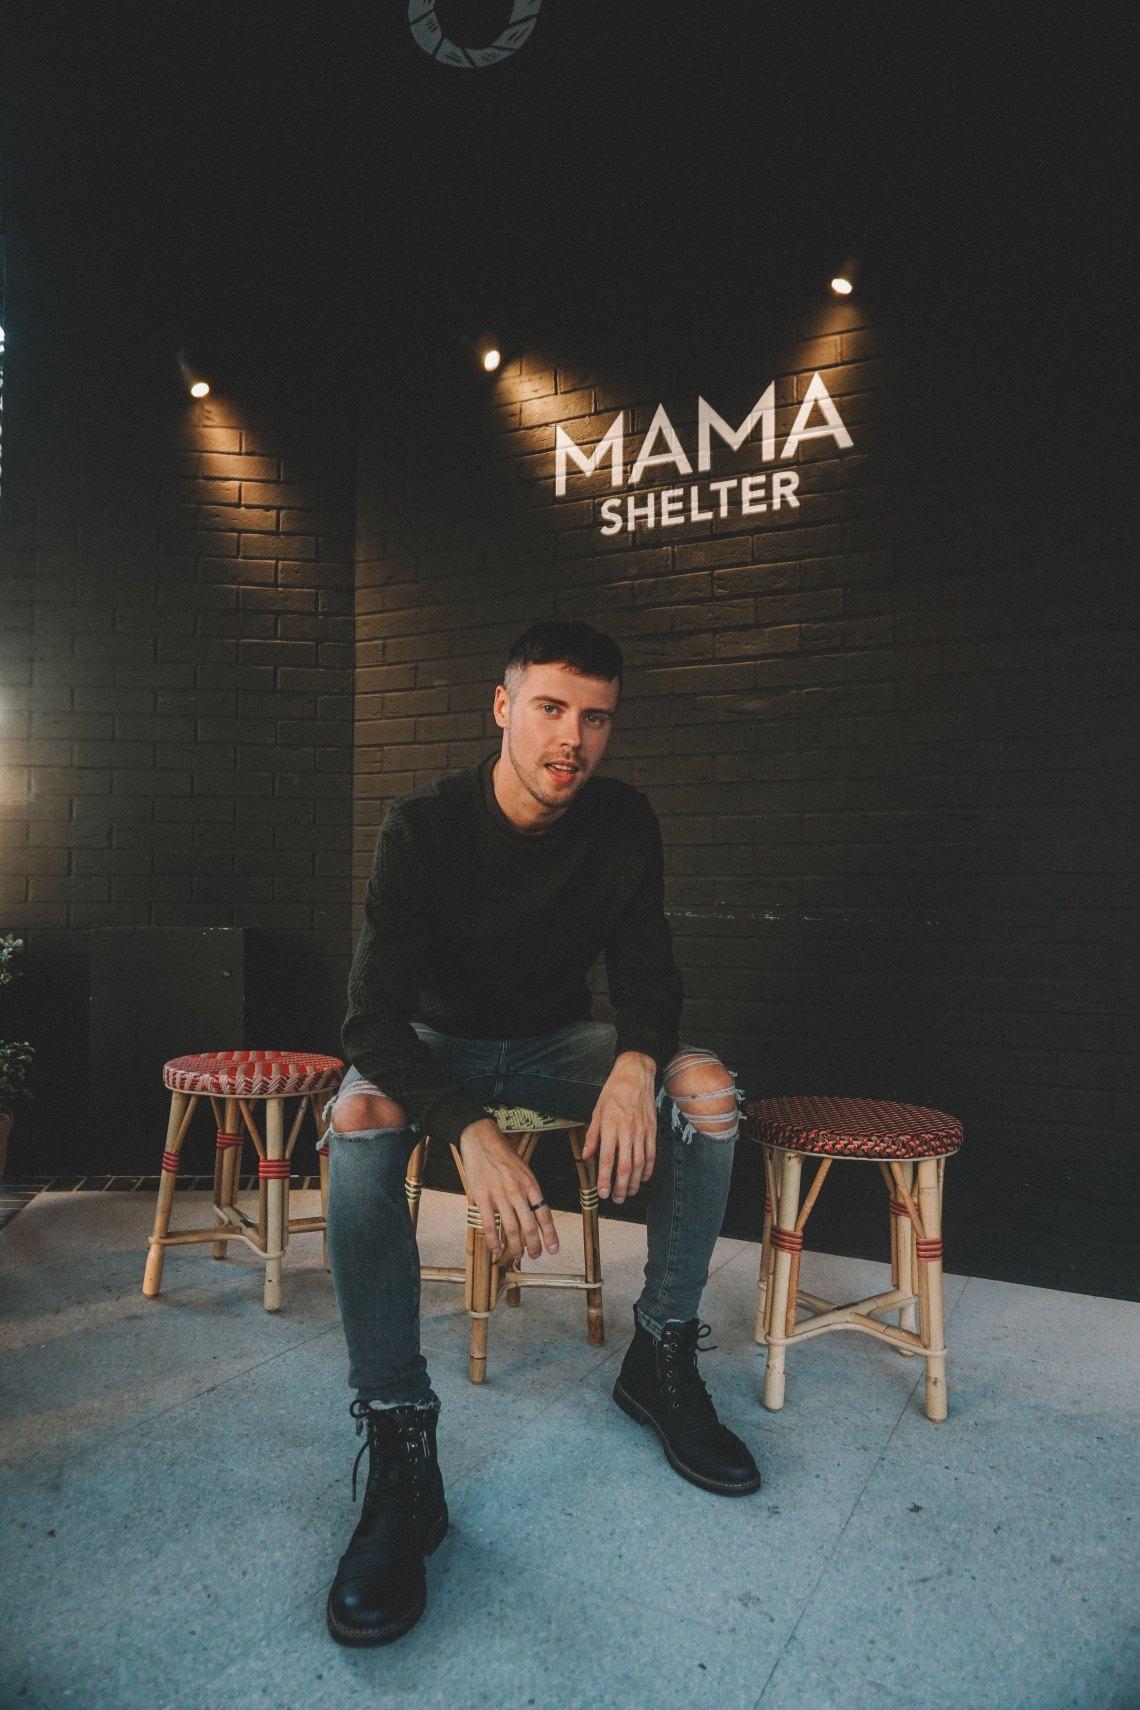 Outside Mama Shelter London. Blog by Skirmantas Petraitis.